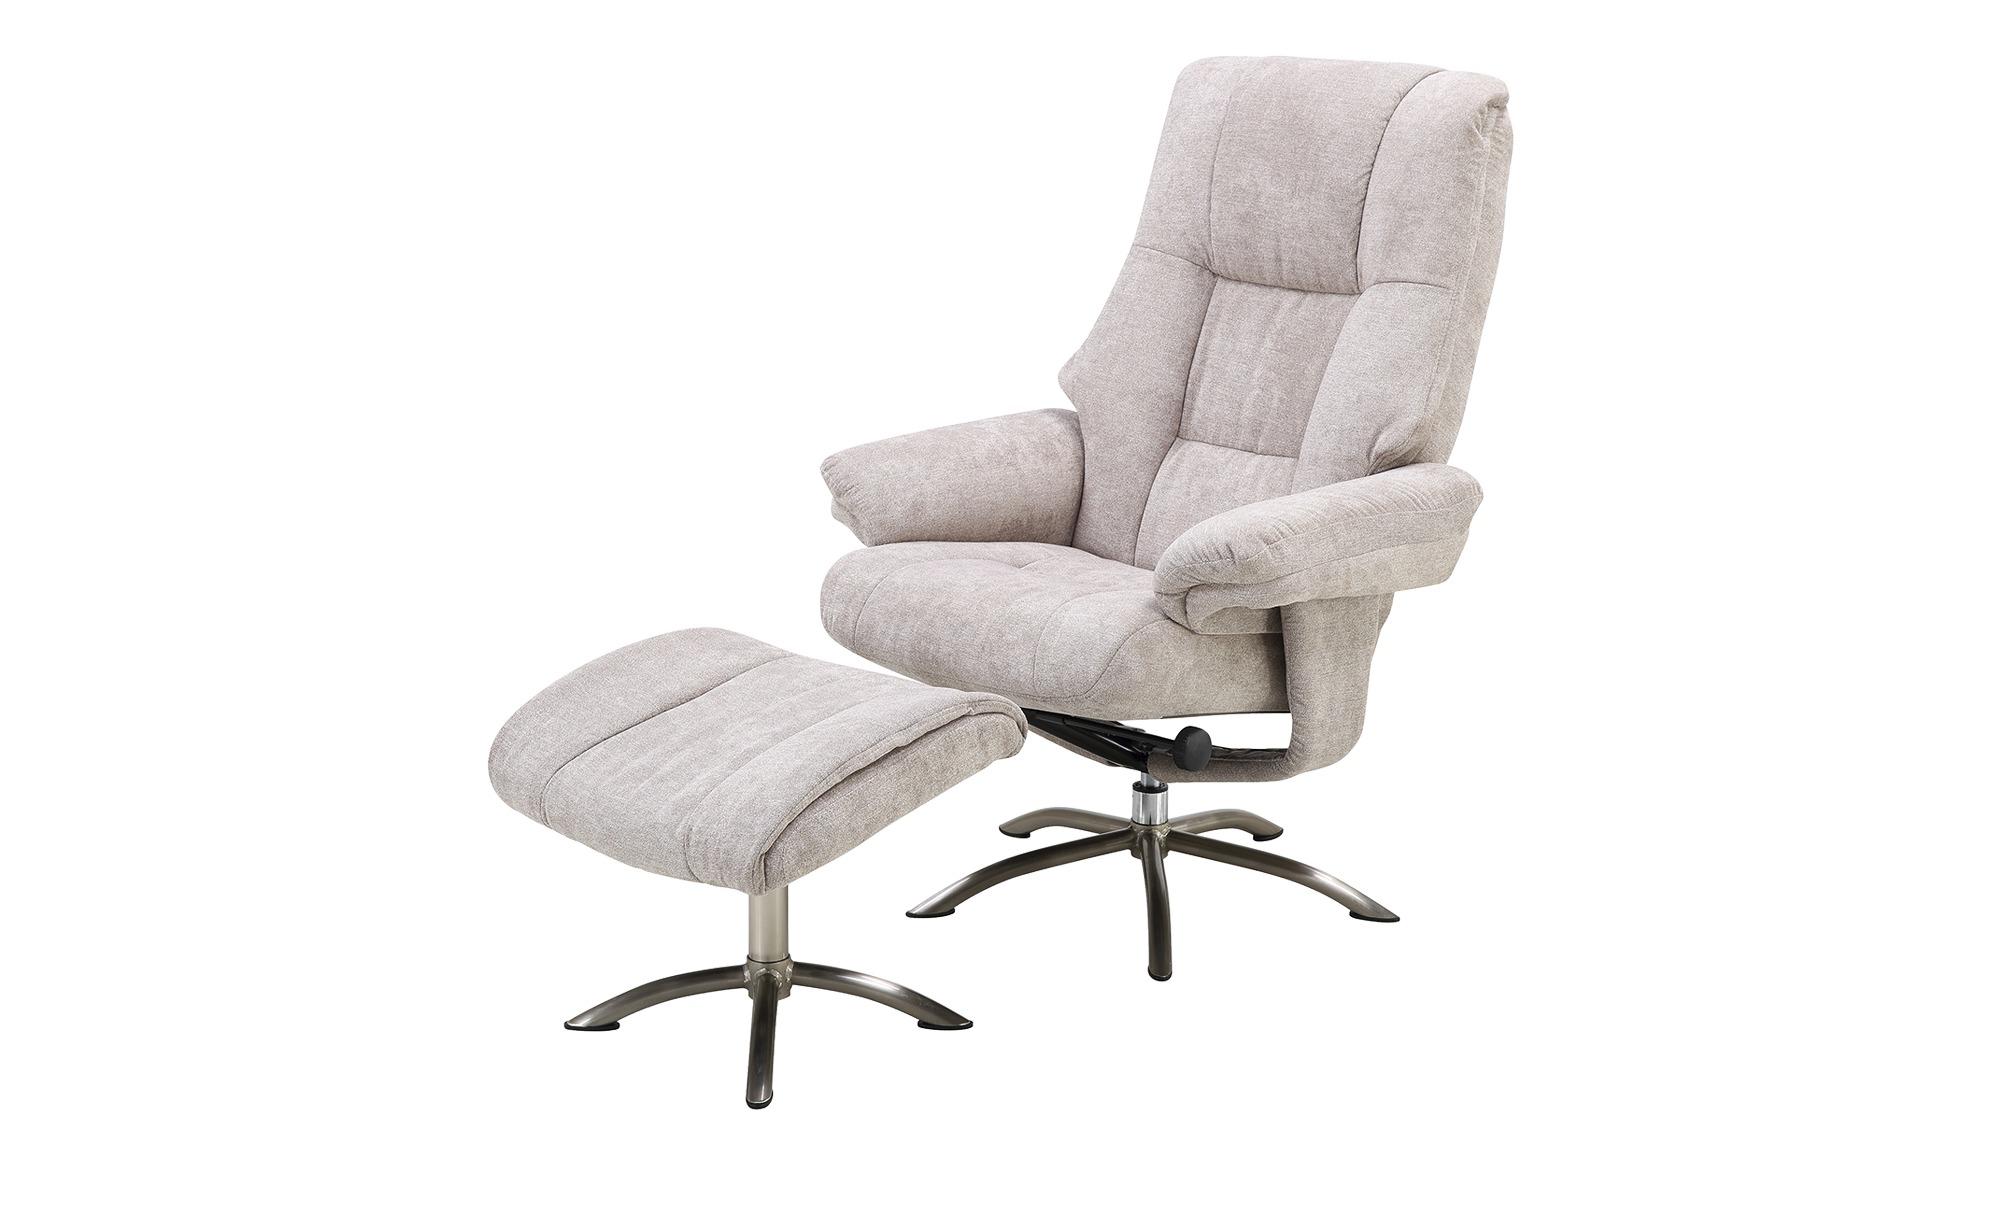 Relaxsessel  Gina ¦ beige ¦ Maße (cm): B: 78 H: 114 T: 86 Polstermöbel > Sessel > Fernsehsessel - Höffner